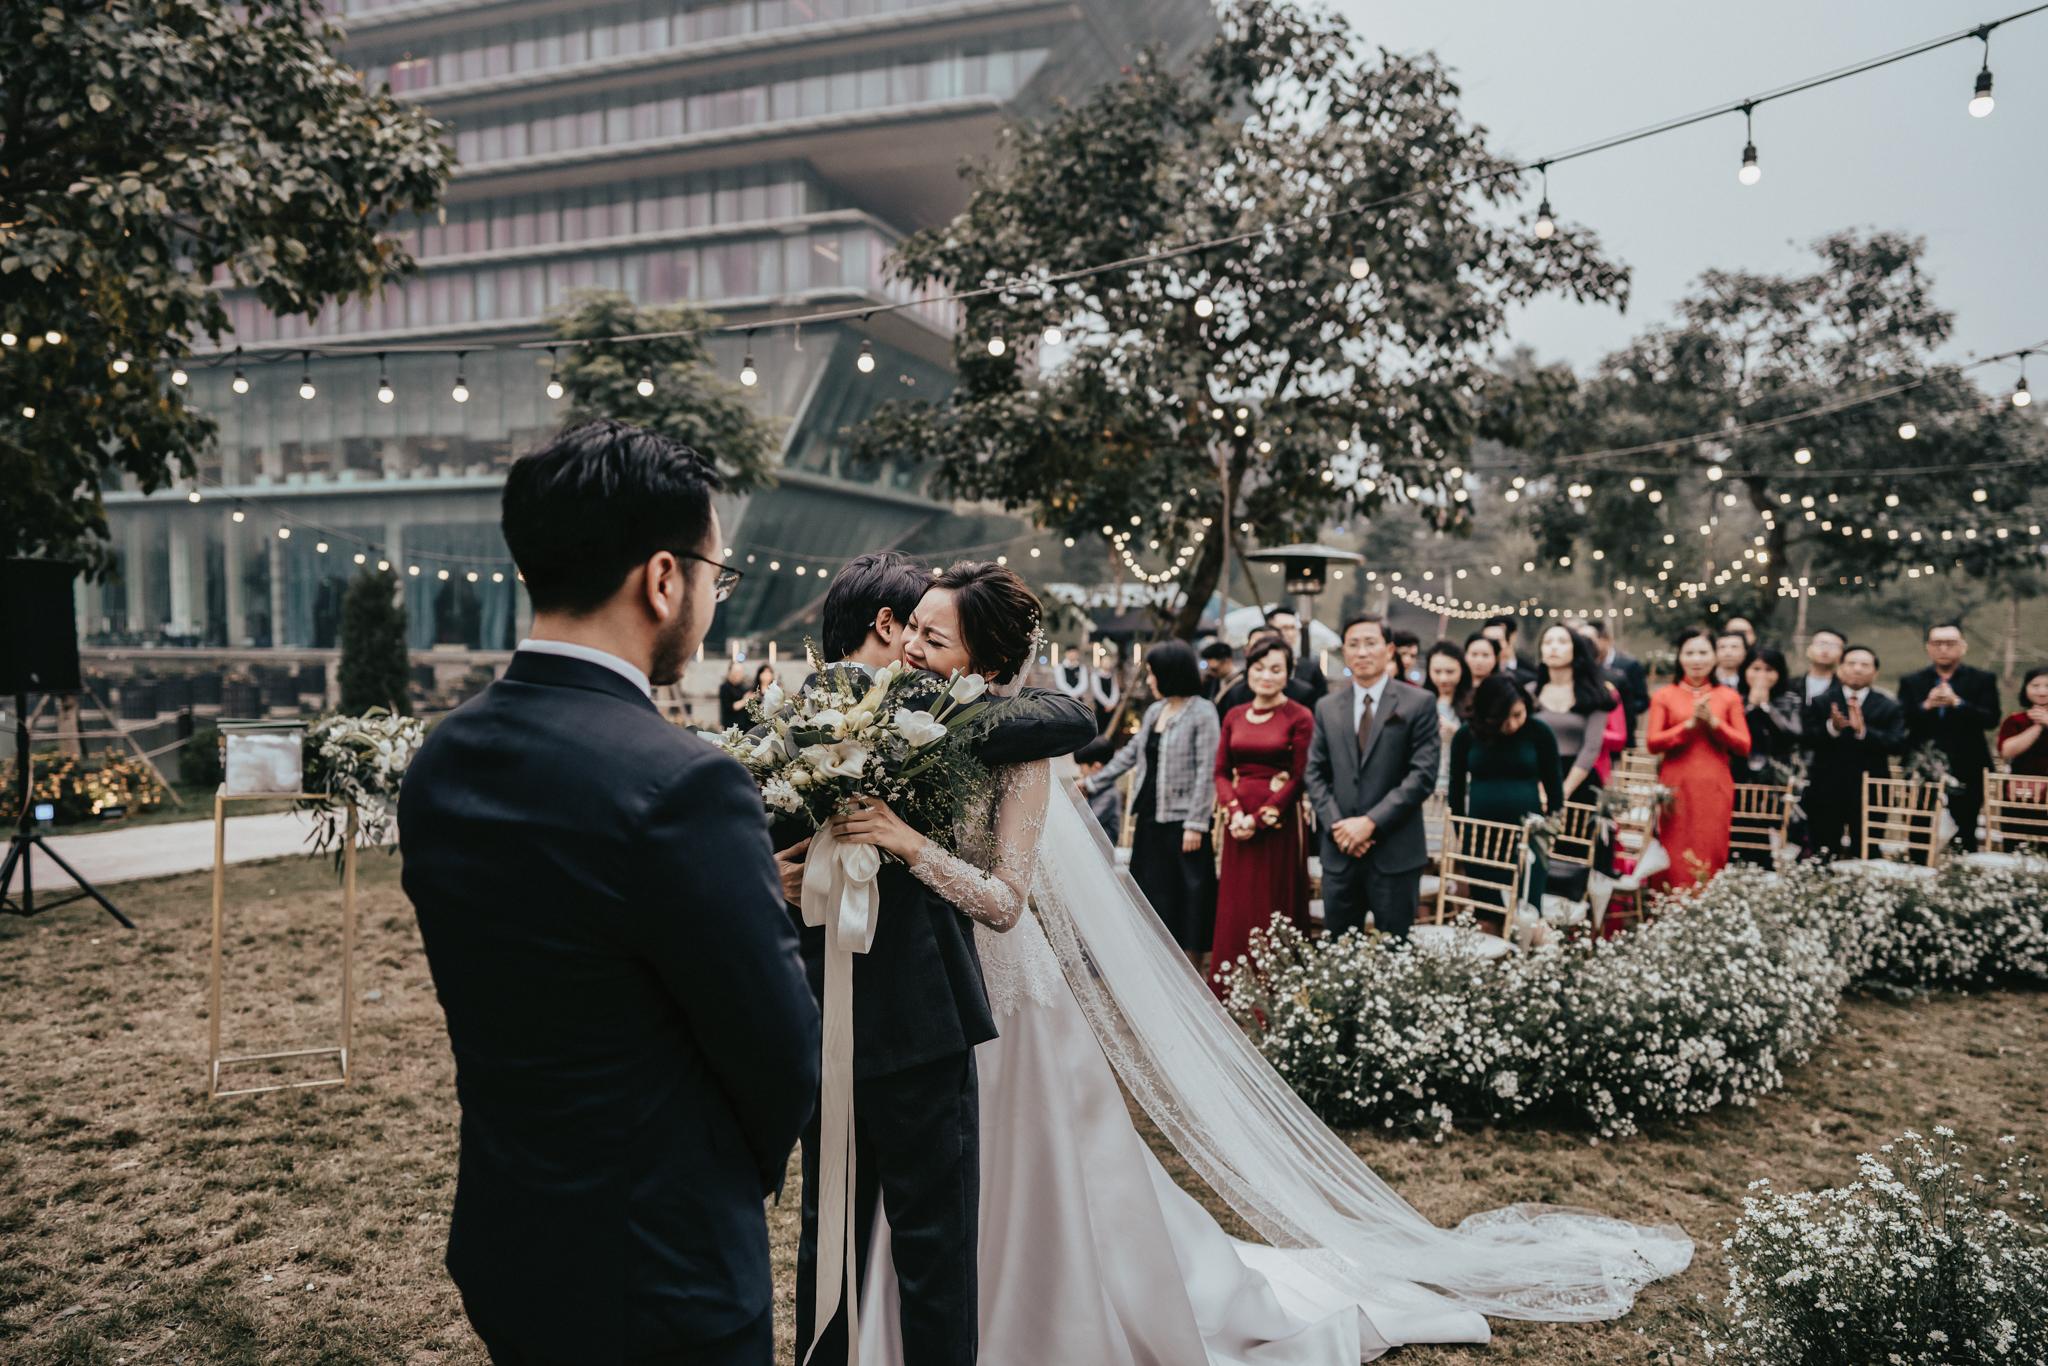 JWMarriott Ha Noi Intimate Wedding of Trang Hi well captured by Hipster Wedding Vietnam Wedding Photographer-35864.jpg